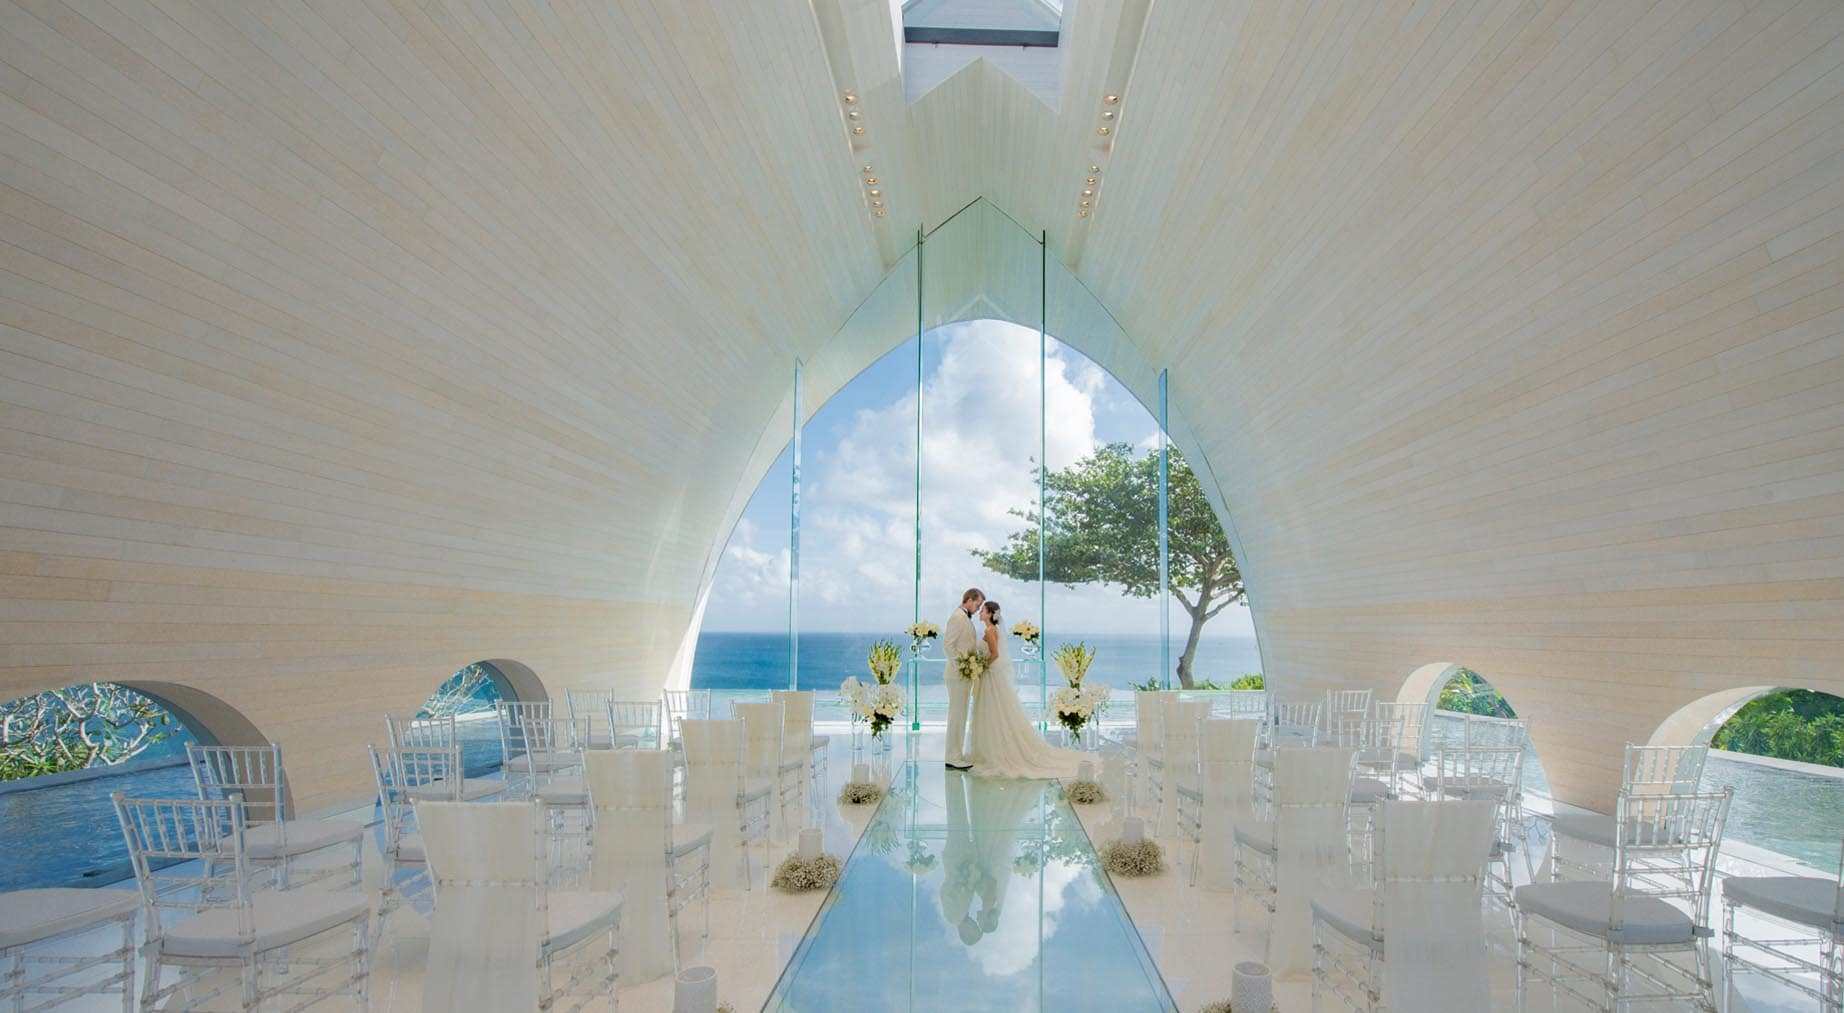 AYANA 婚礼场地